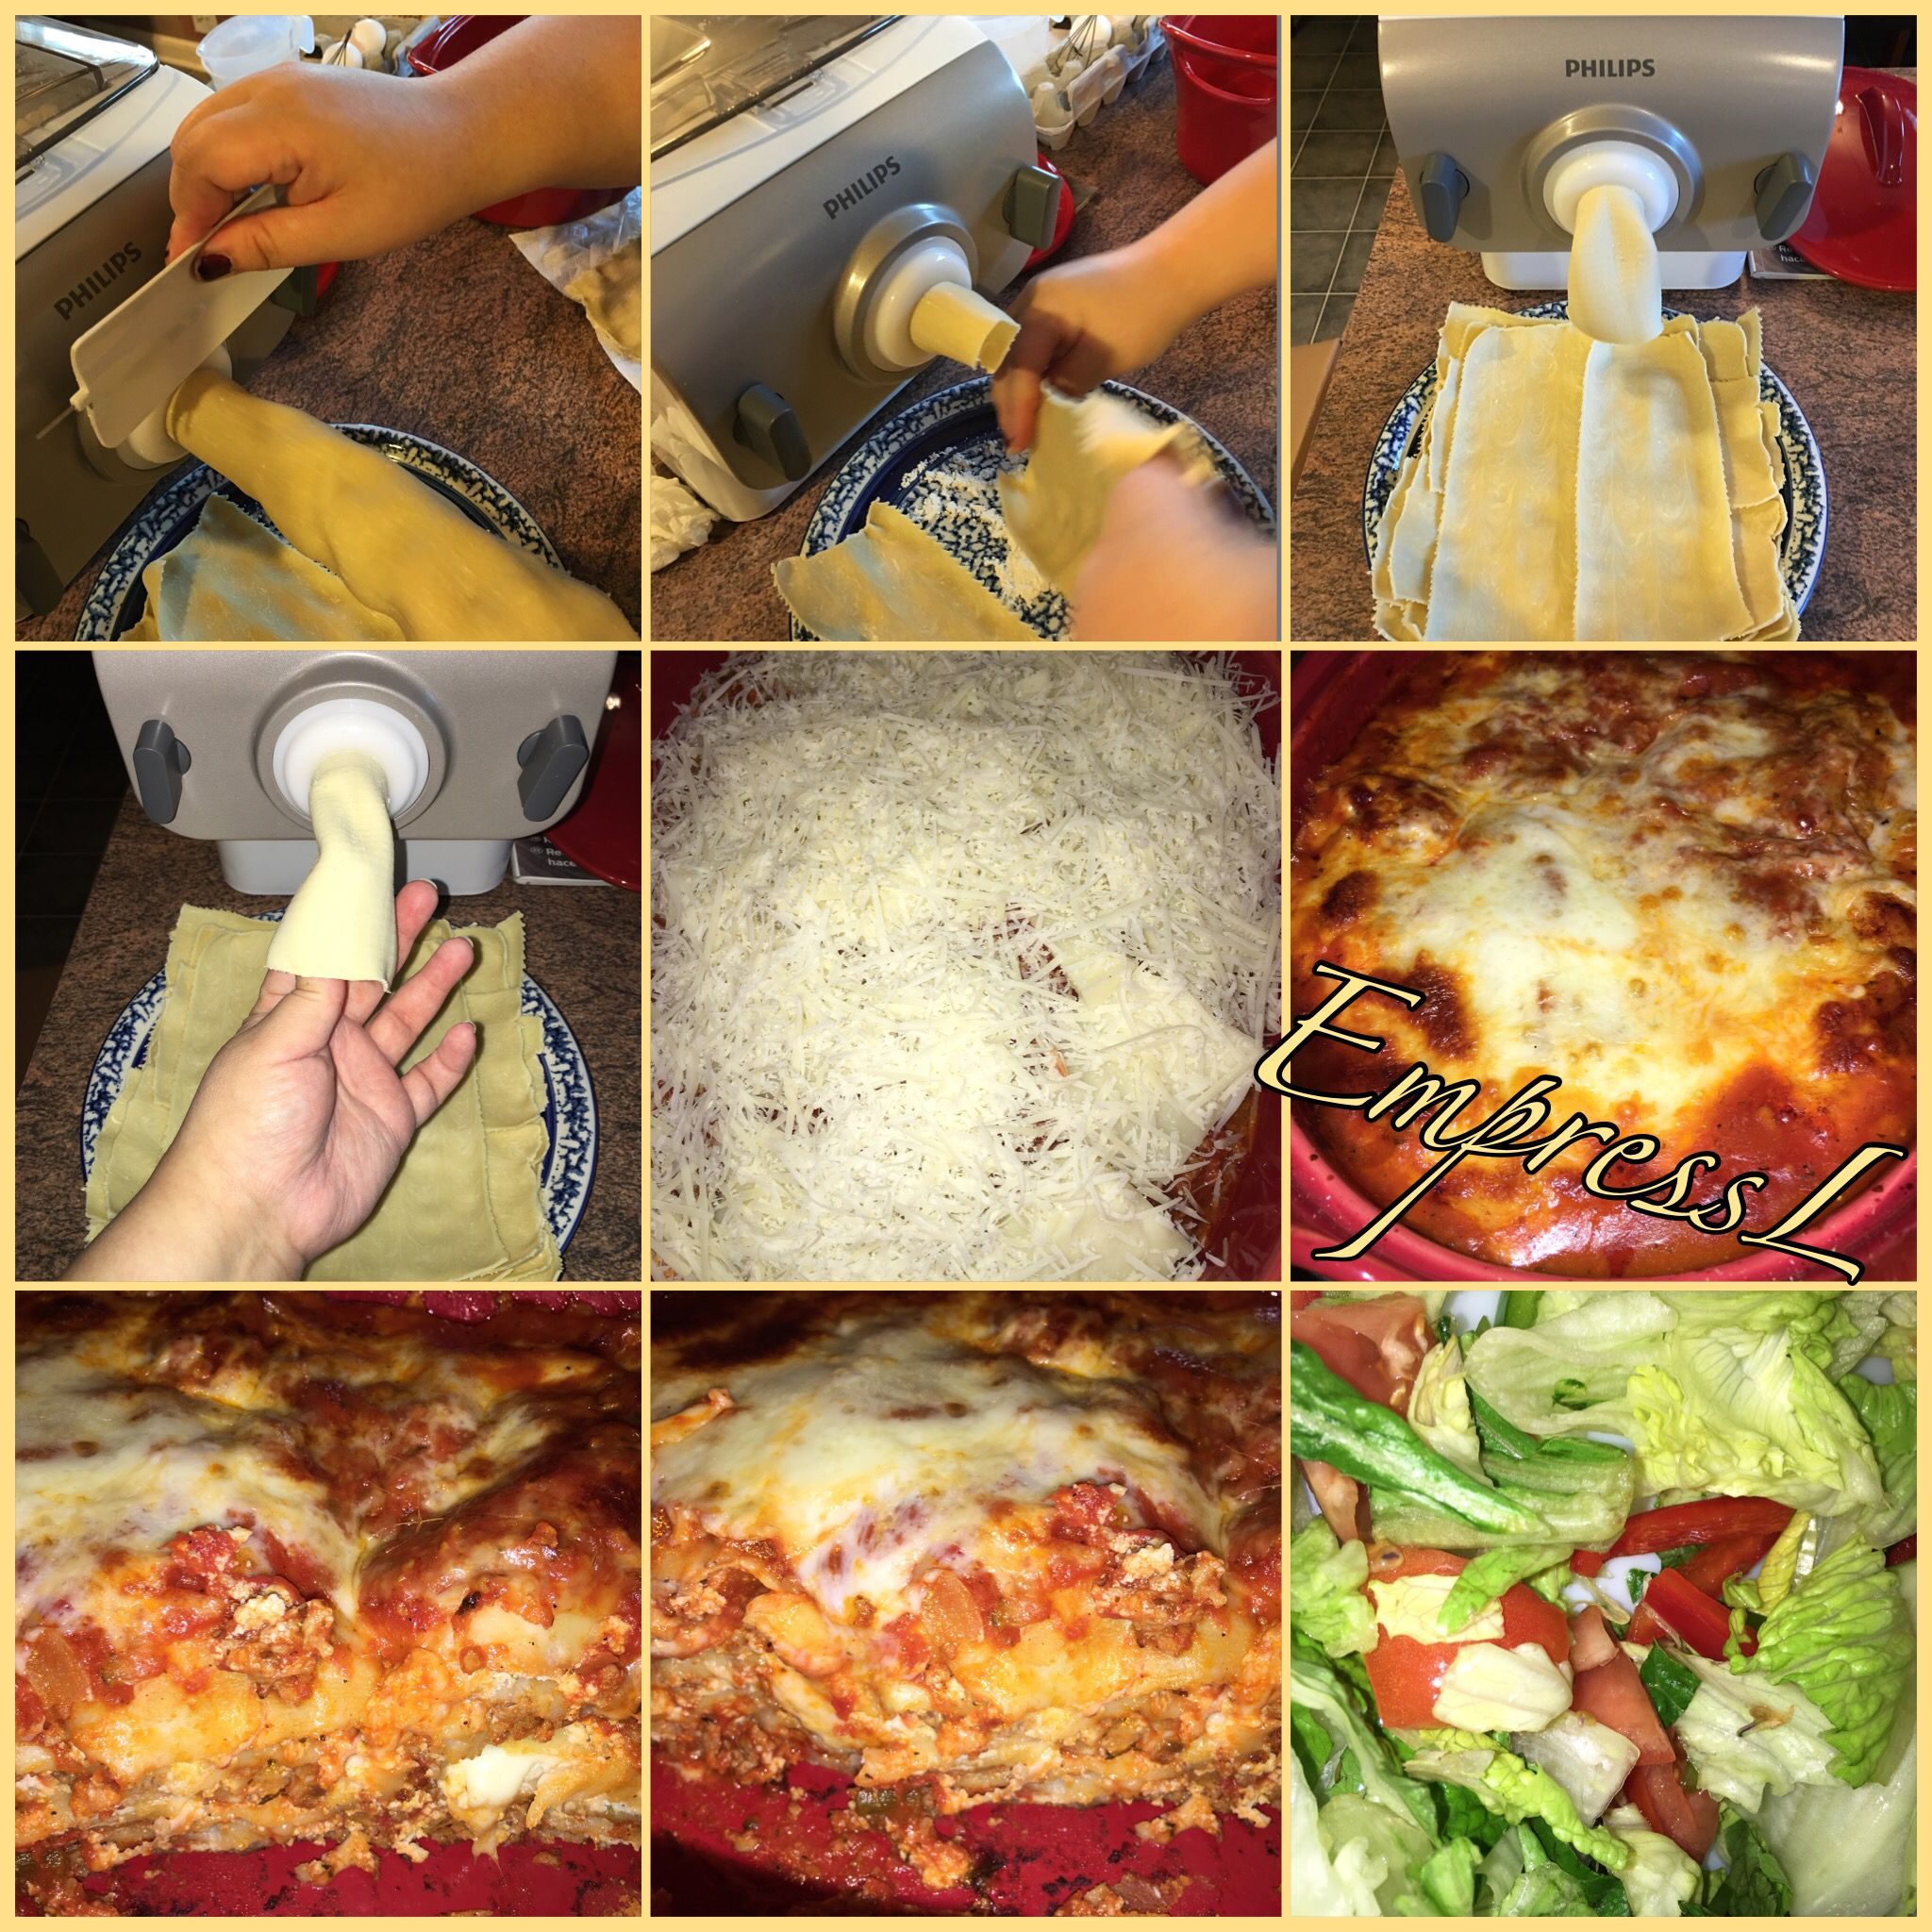 First Time Making Homemade Lasagna Using The Philips Pasta Maker Homemade Pasta Recipe Homemade Lasagna Pasta Maker